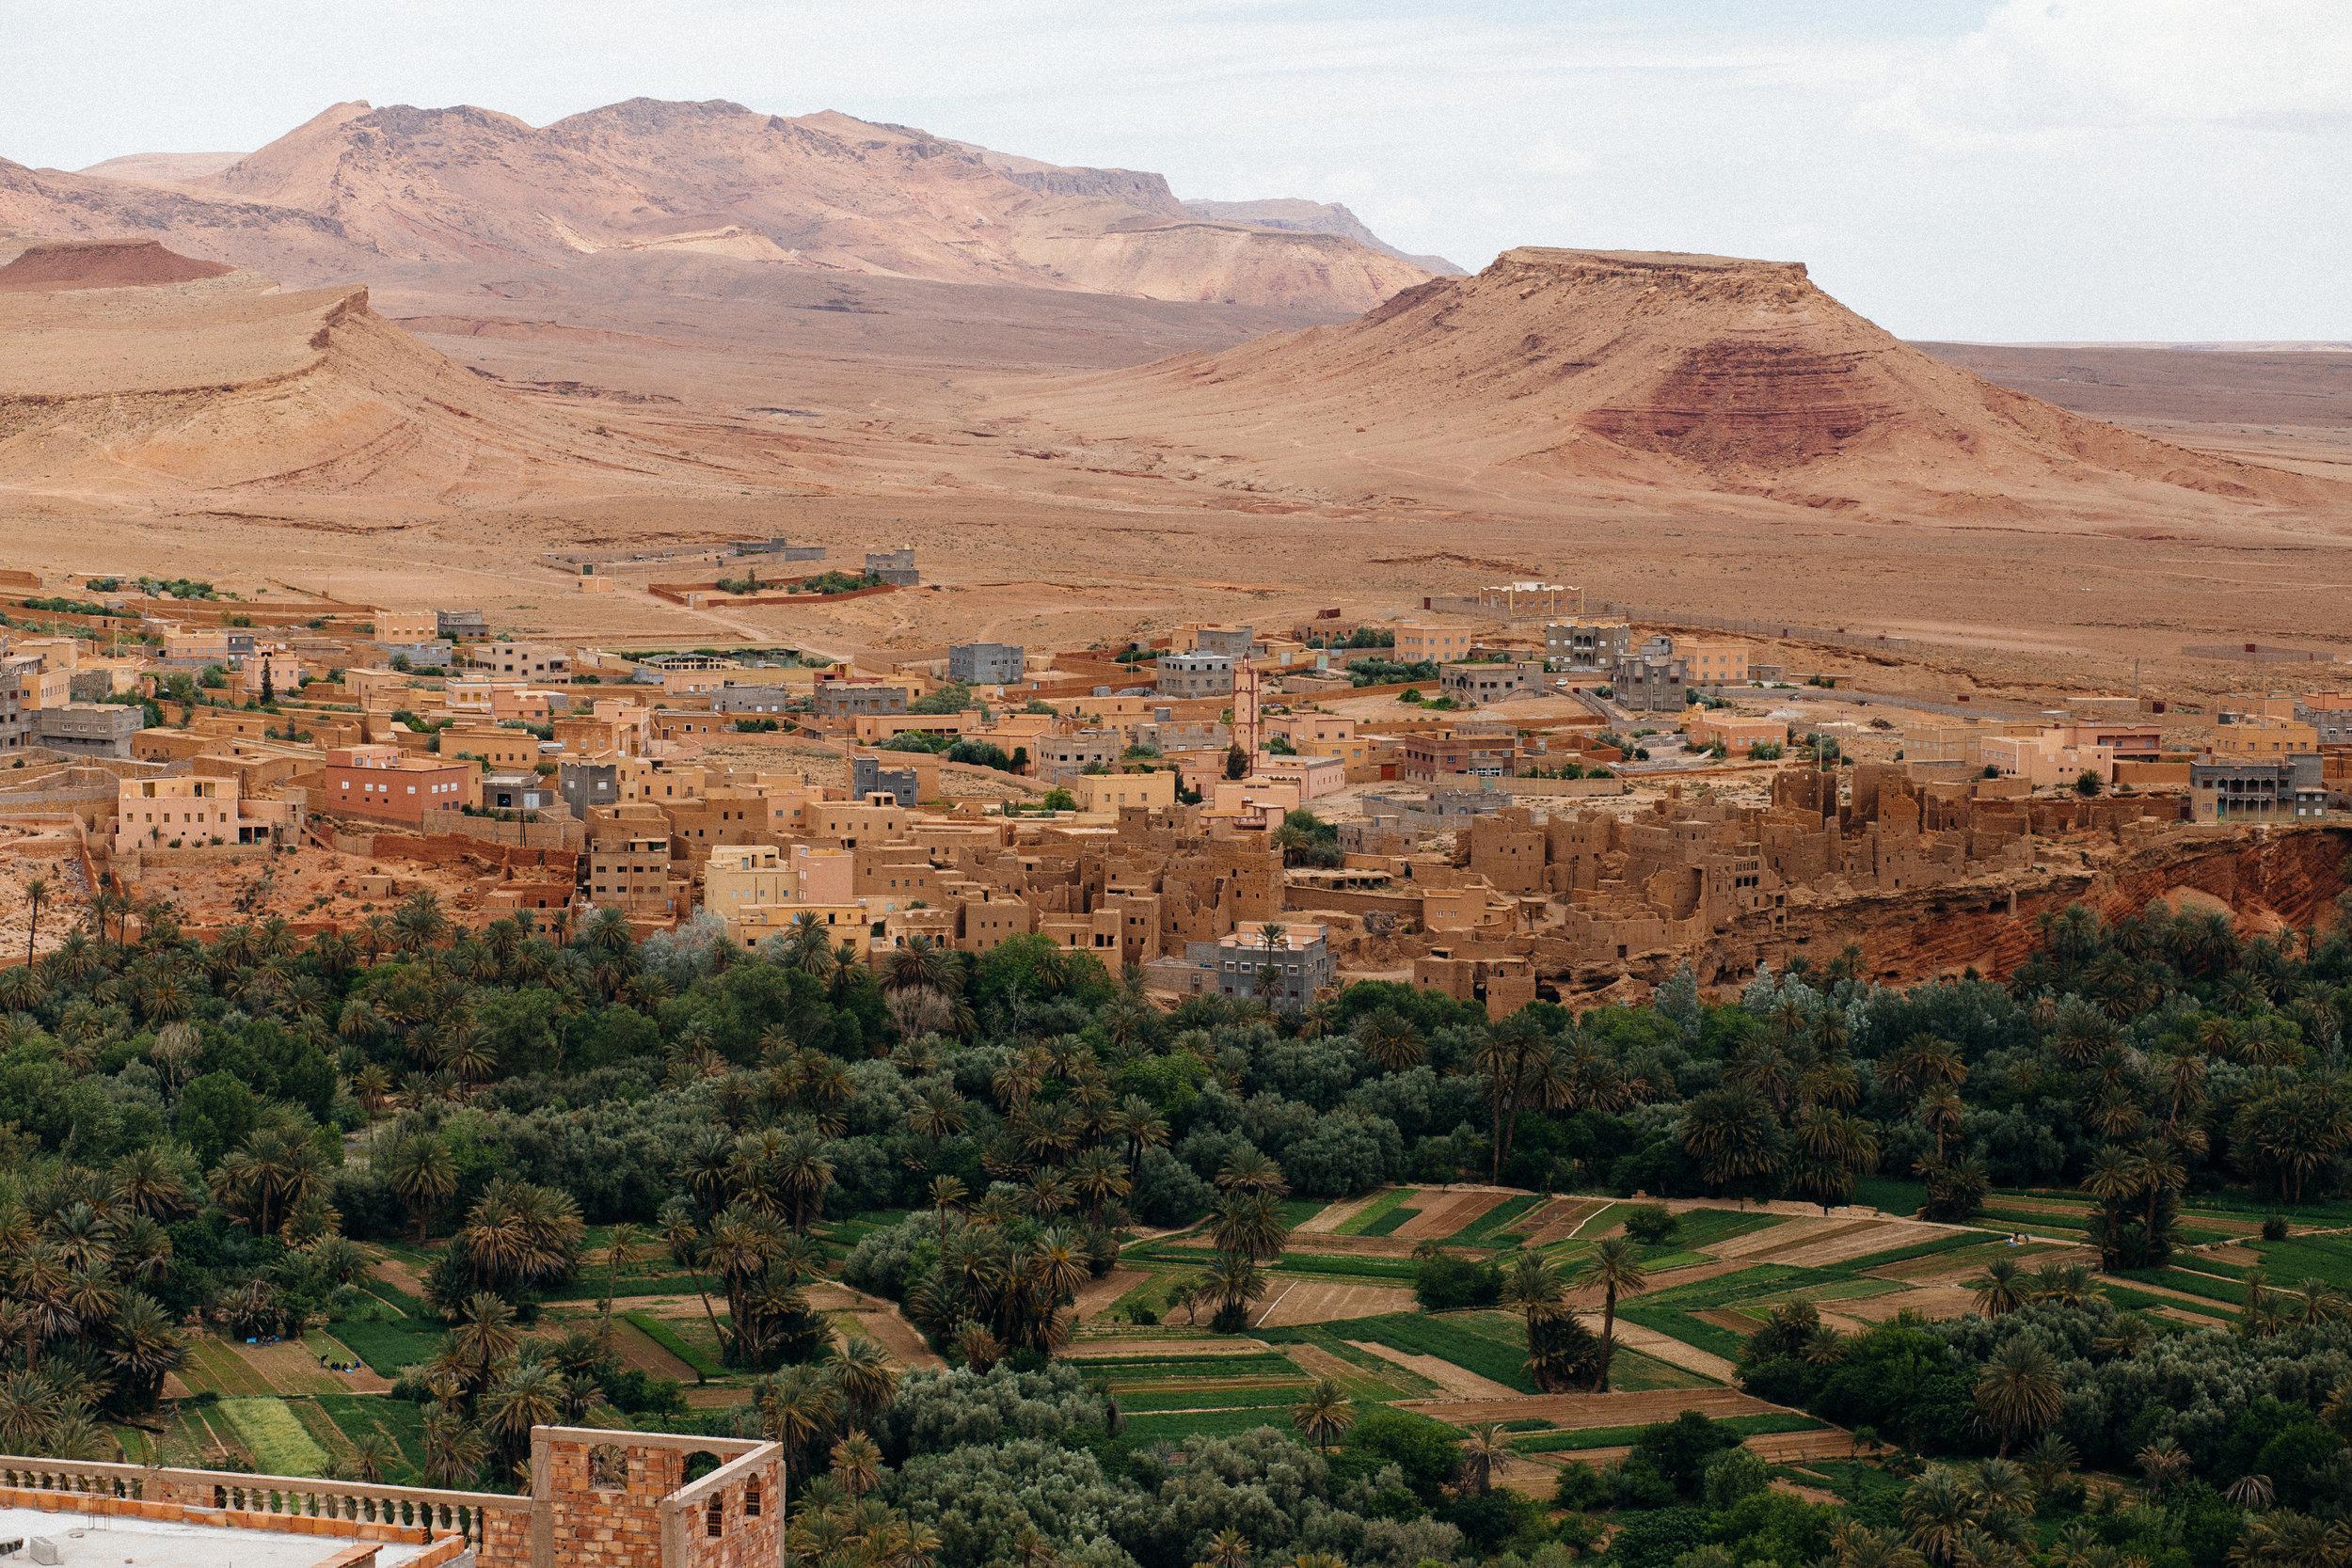 morocco-morocco travel-visit morocco-travel-travel photography-travel photographer-alina mendoza-alina mendoza photography-123.jpg